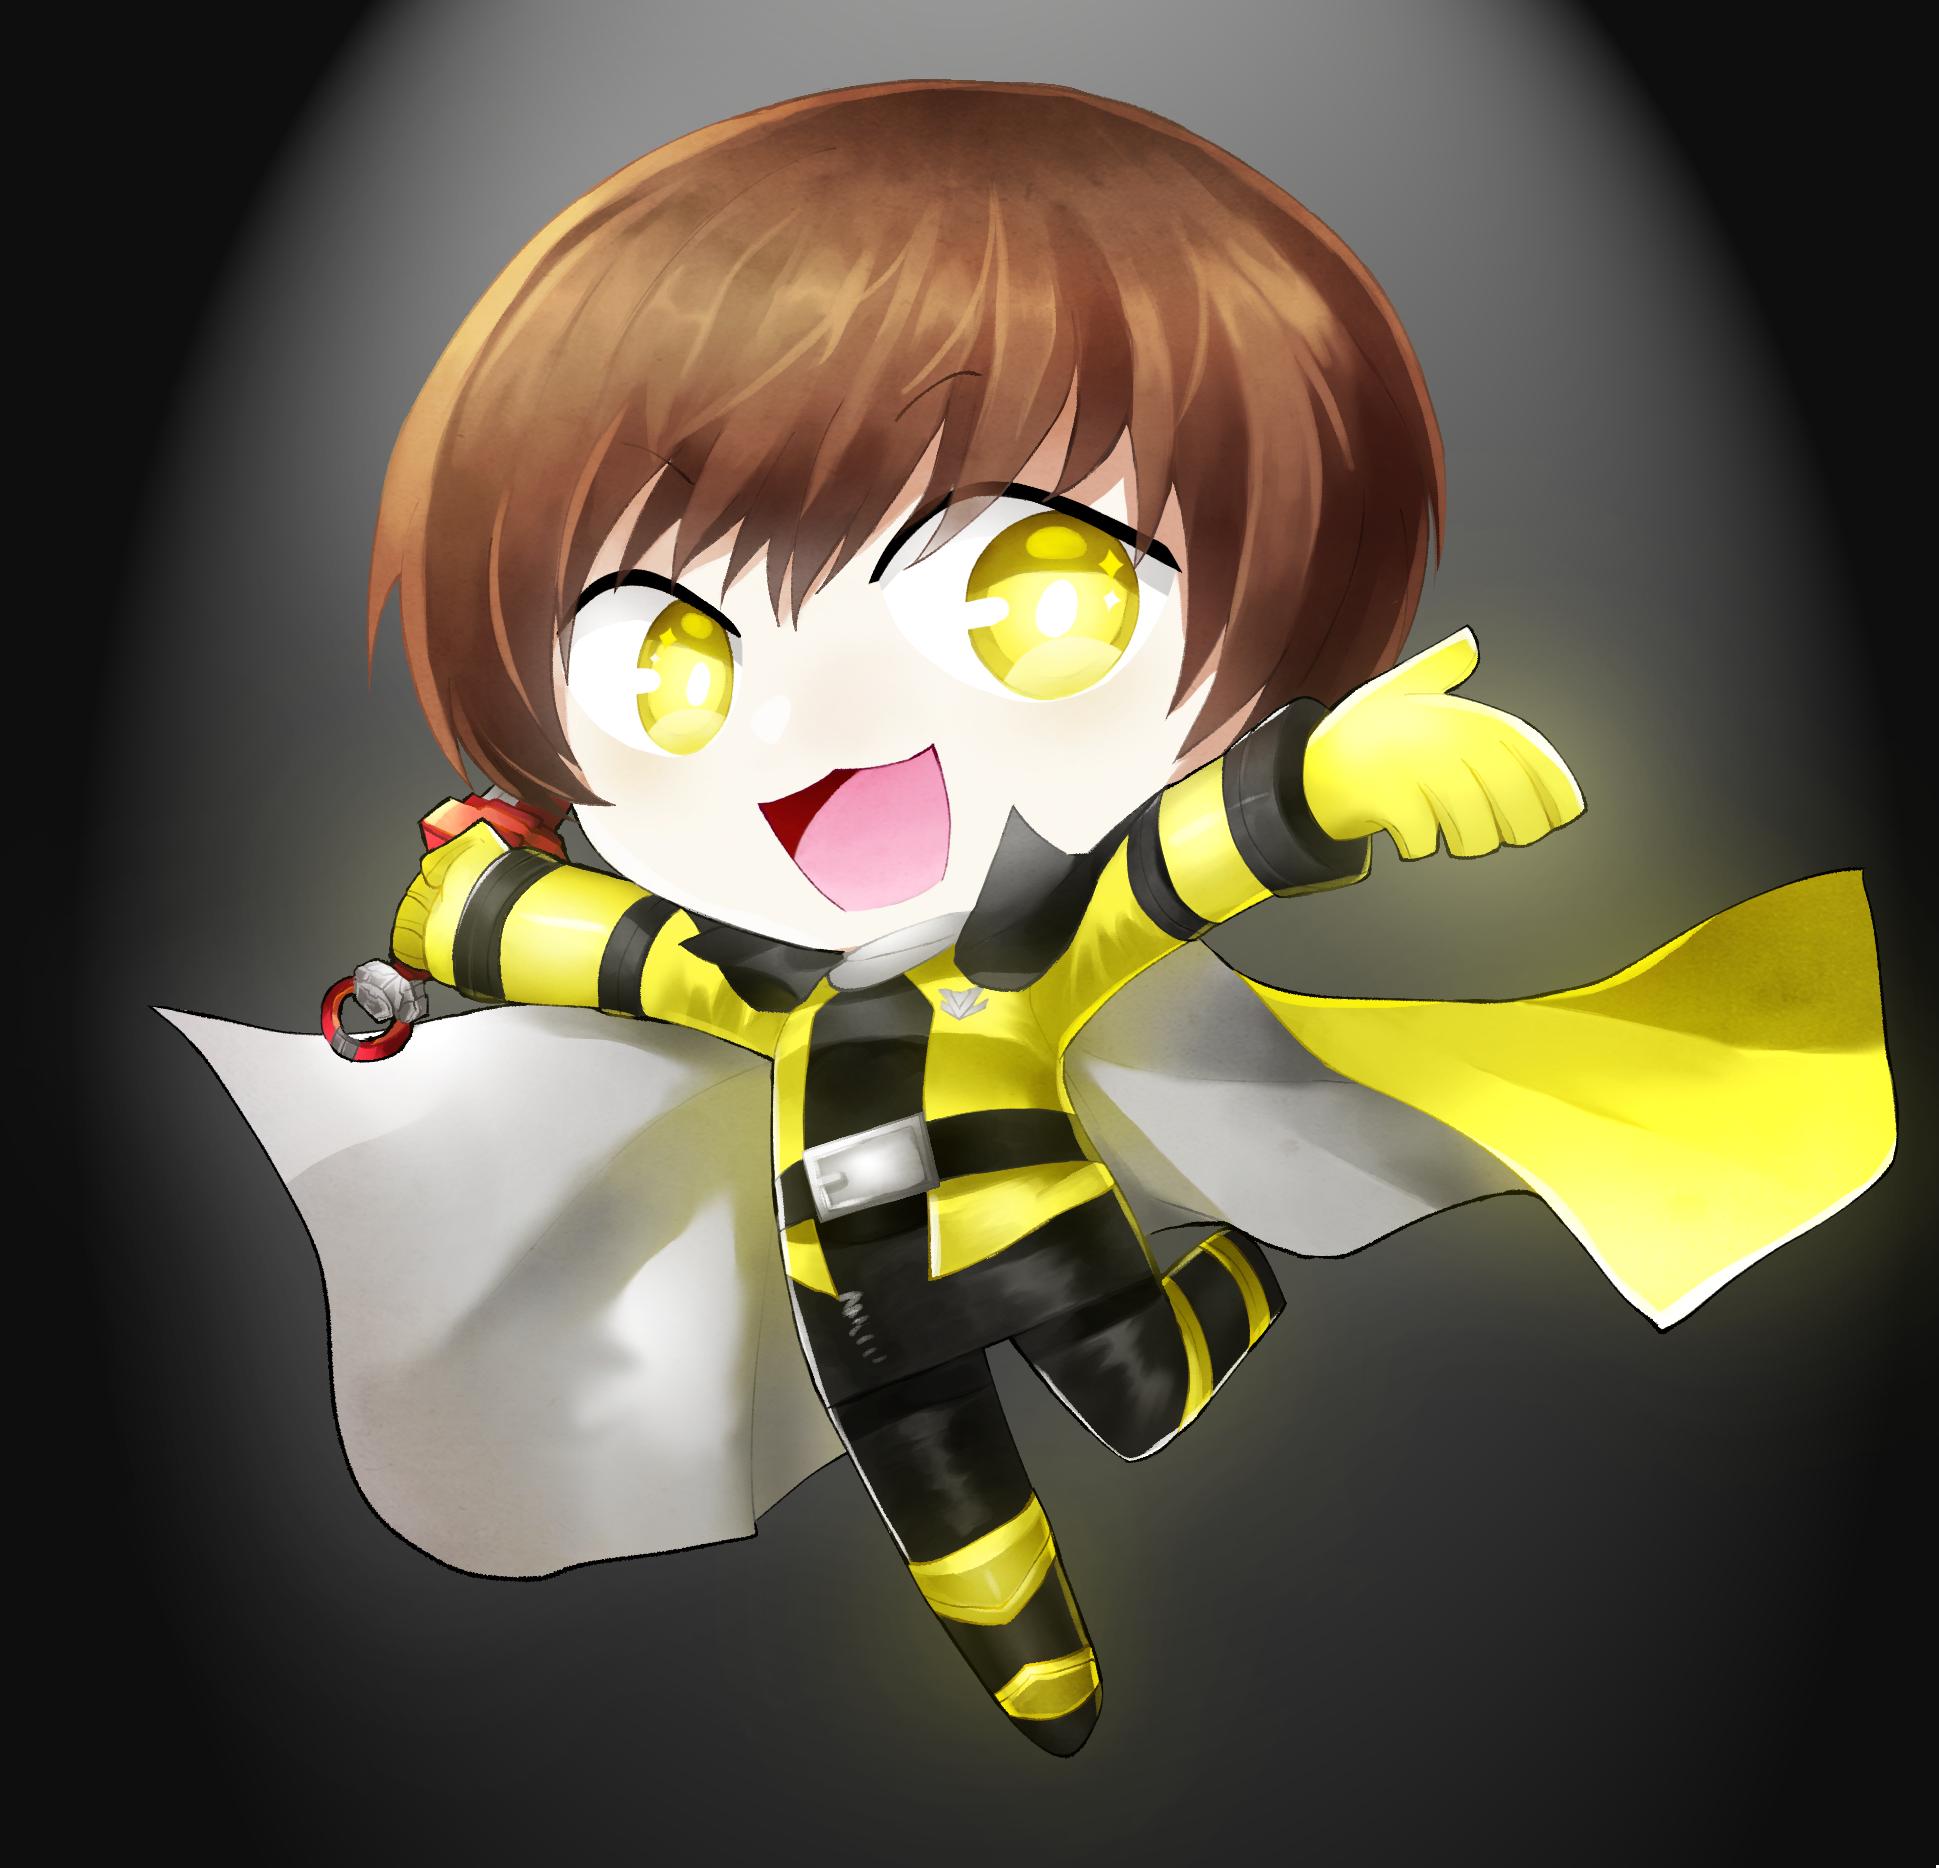 Chibi Lupin yellow Seni